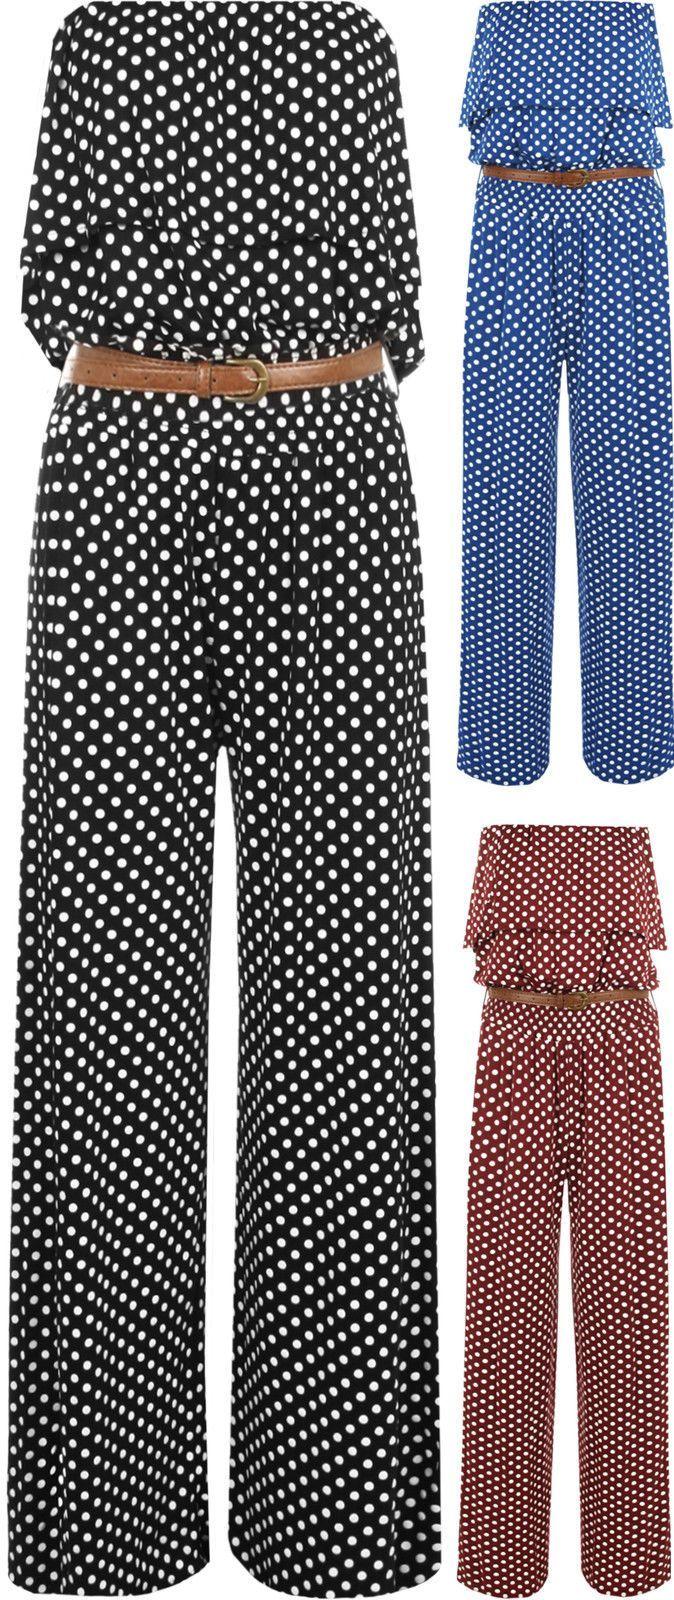 Womens Polka Dot Spot Print Layered Boob Tube Sleeveless Pants Ladies Jumpsuit